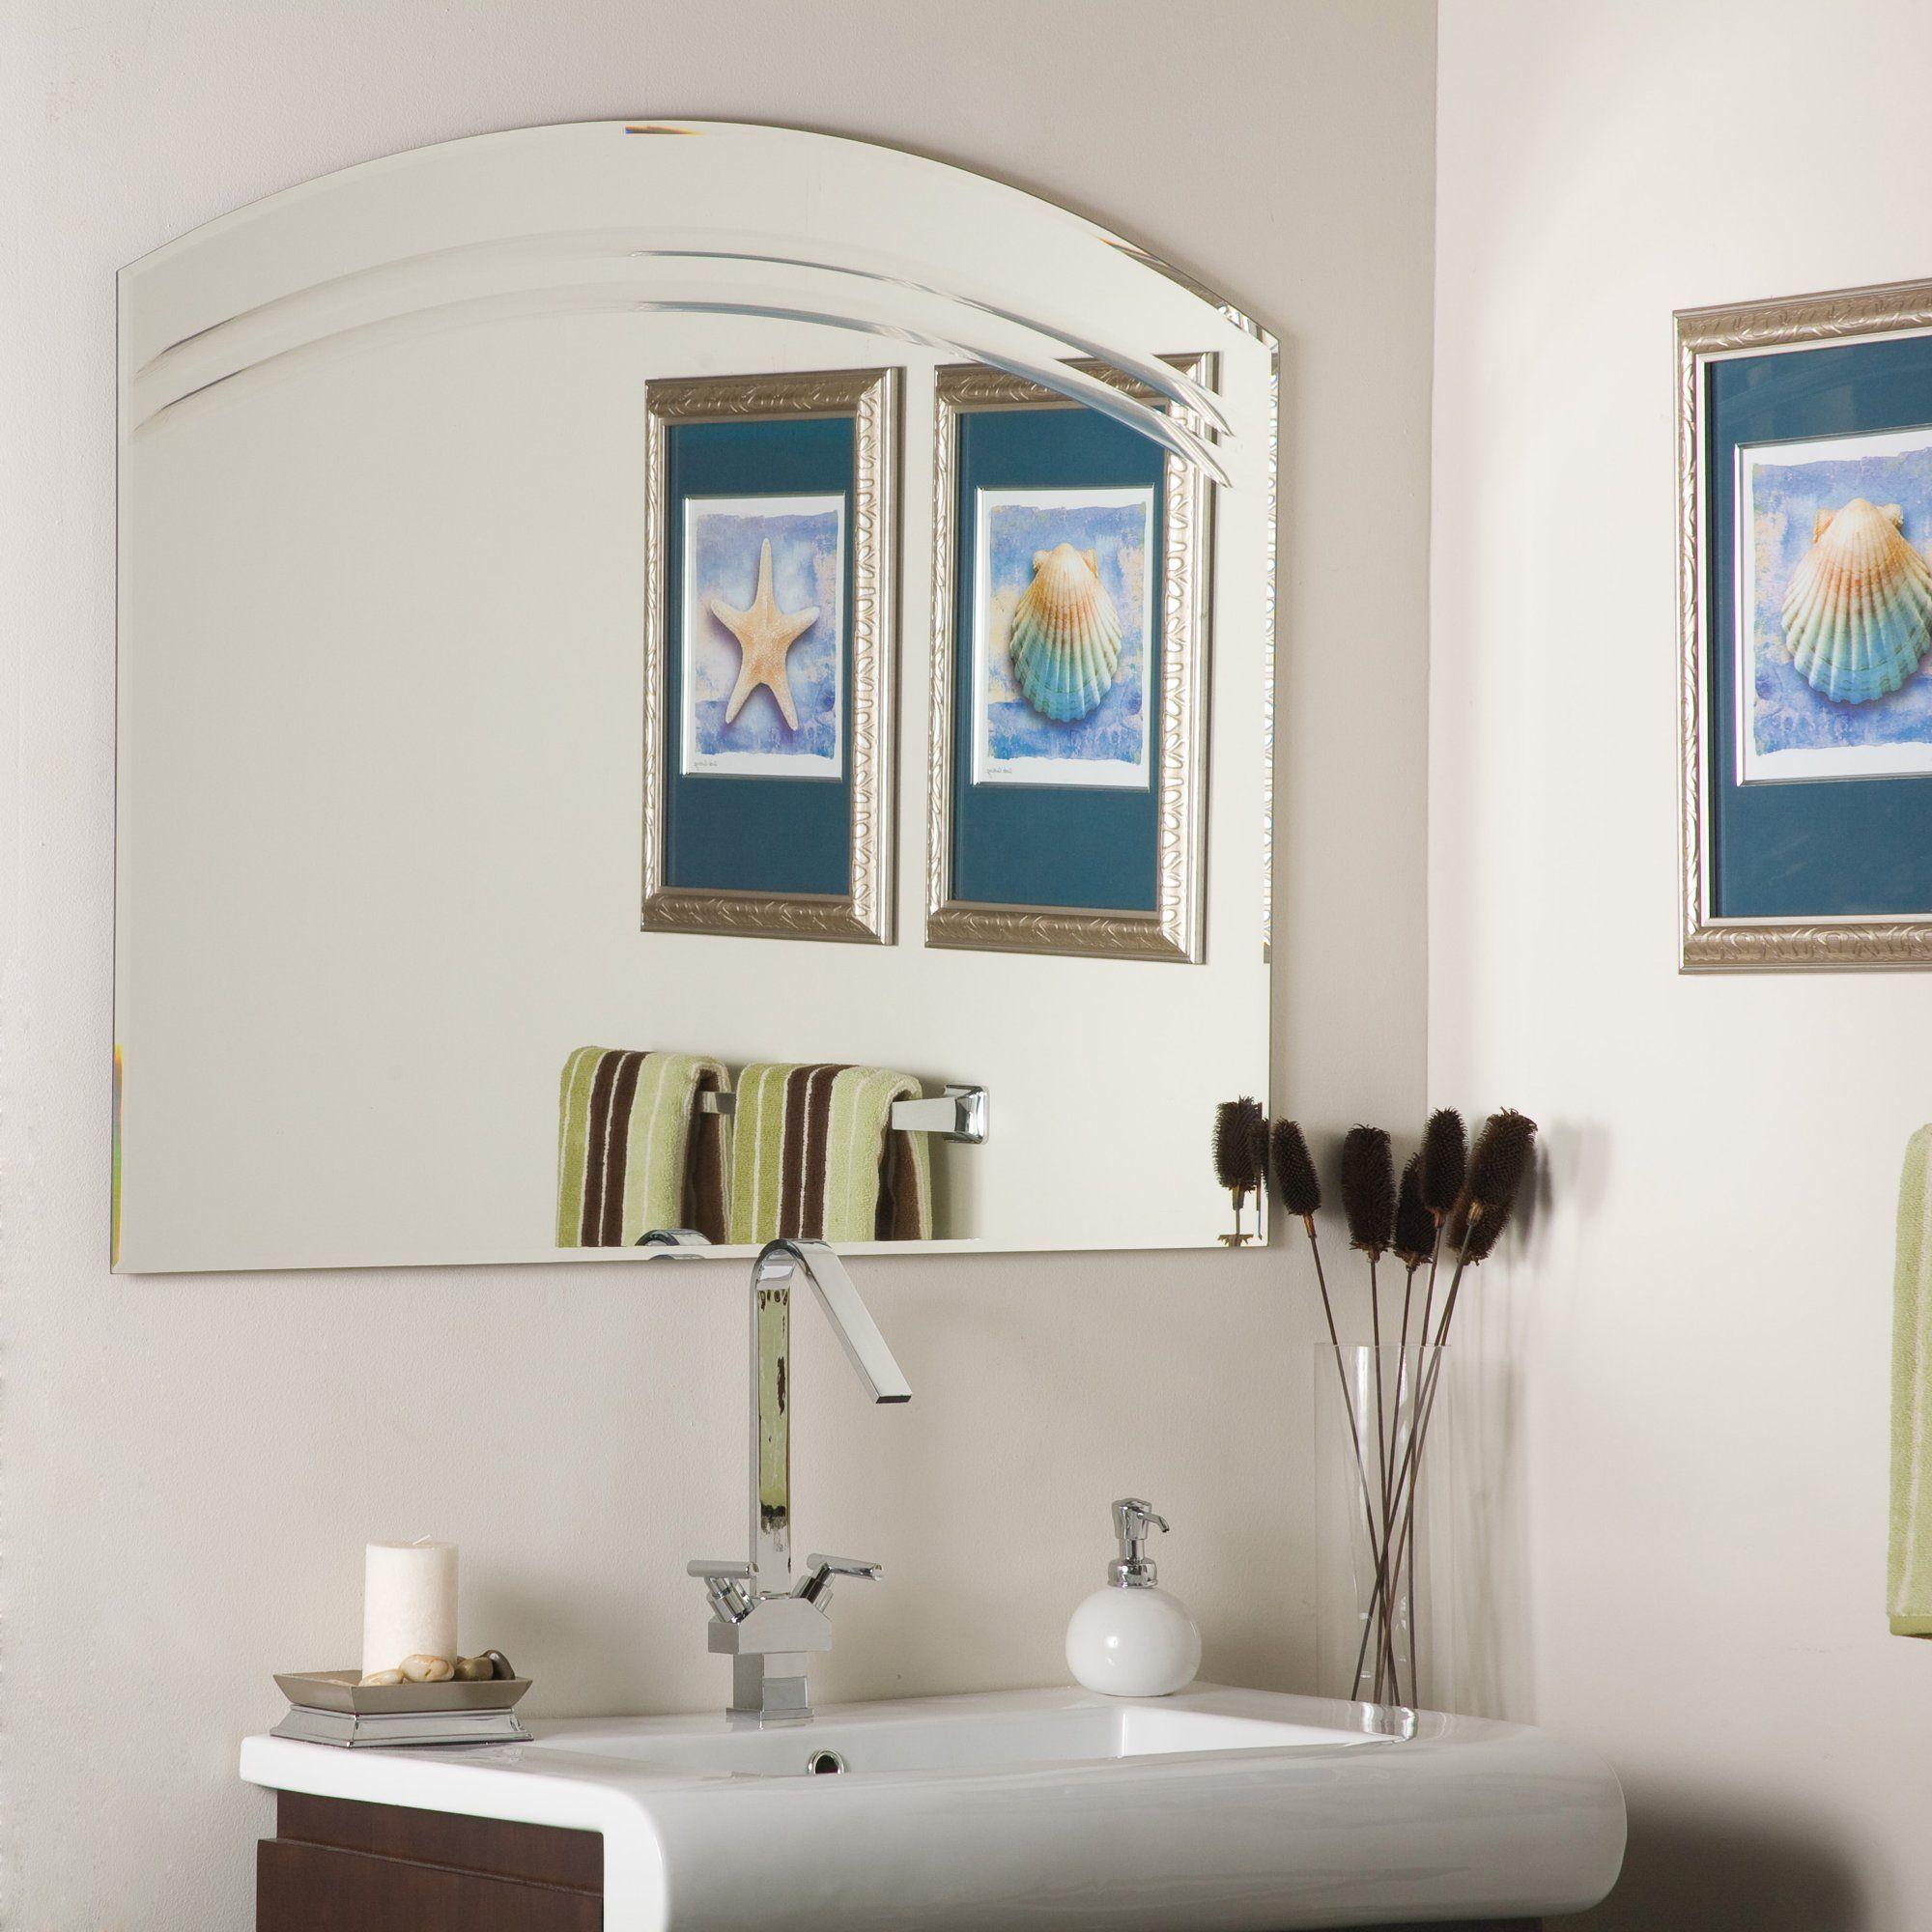 Large 39 5 X 31 5 Arch Crowned Top Beveled Angel Frameless Decorative Mirror By Decor Wonderland Walmart Com Mirror Wall Mirror Decor Mirror Wall Decor